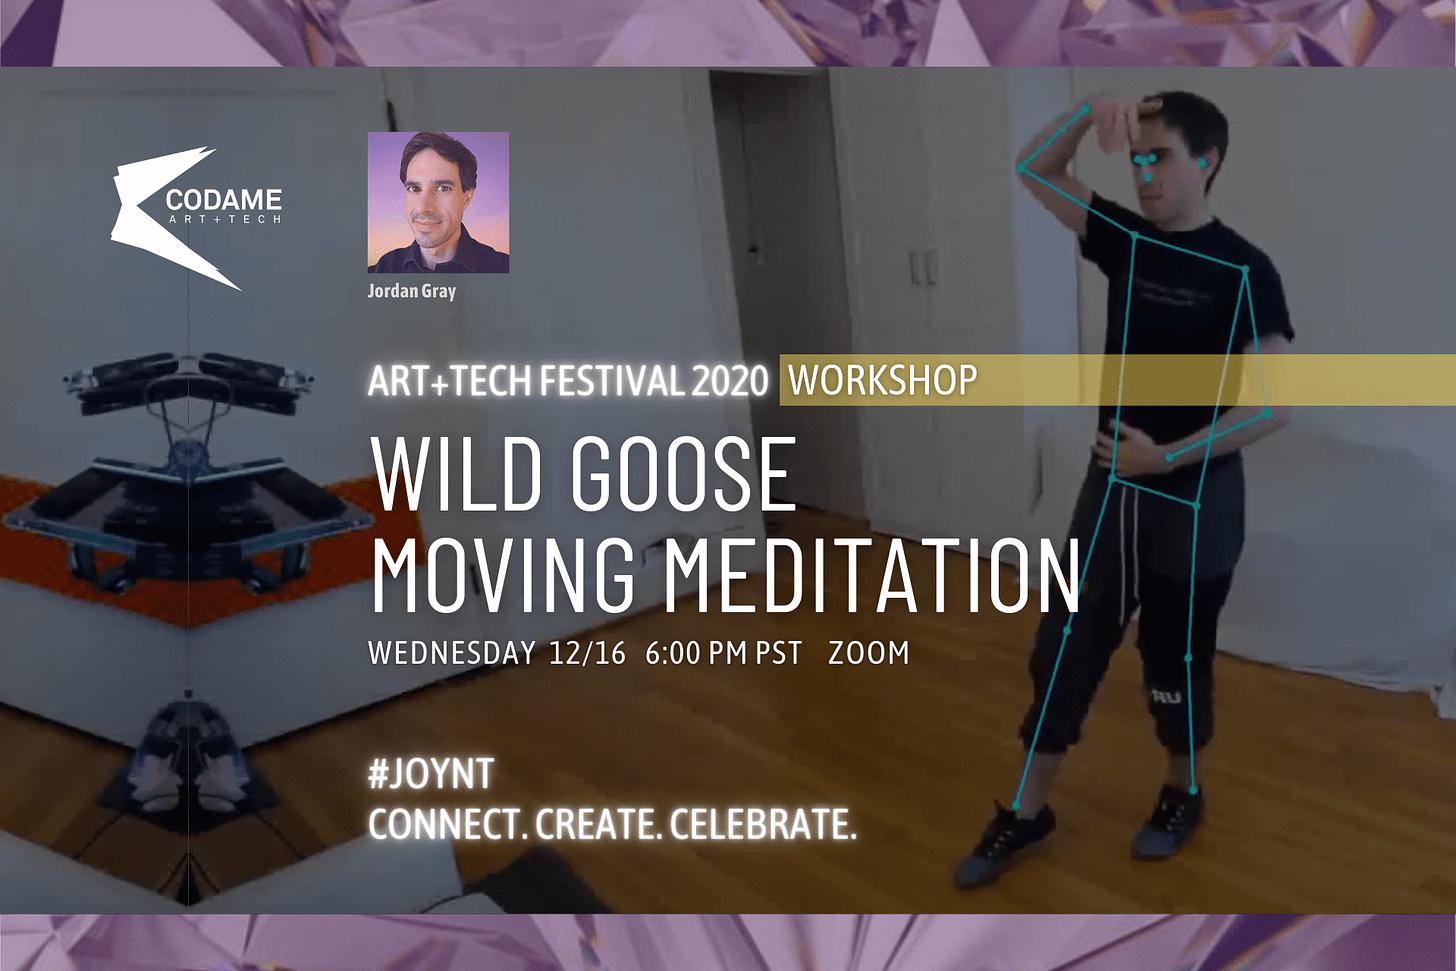 Wild Goose Moving Meditation